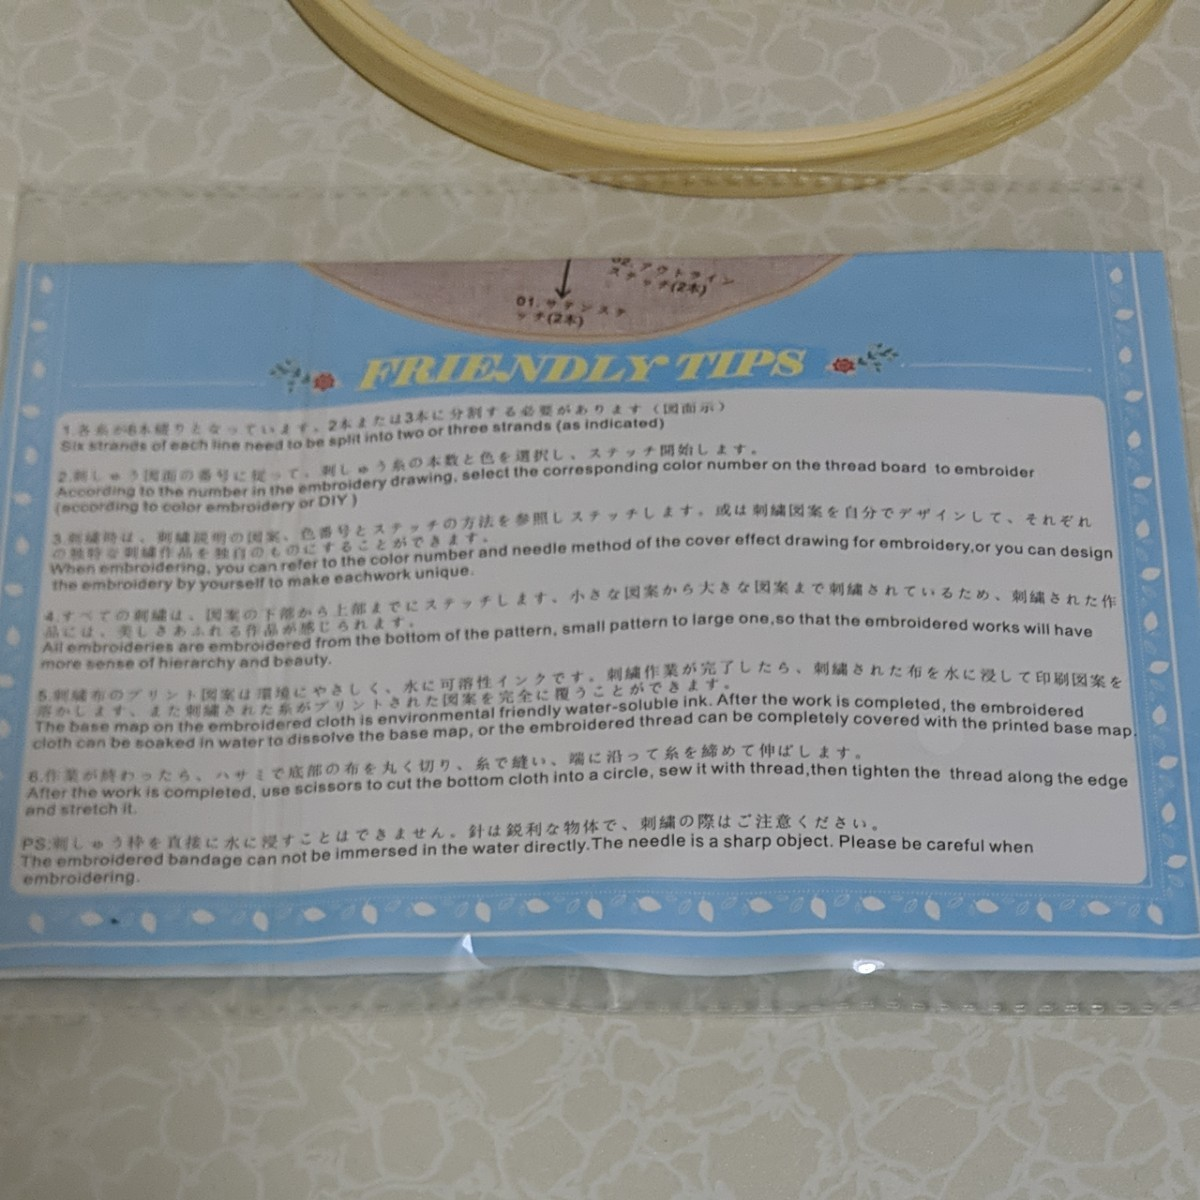 BodiCal 刺繍キット クロスステッチキット 刺しゅう刺繍20CM竹製刺繍枠 刺繍糸 刺繍針、刺繍用布